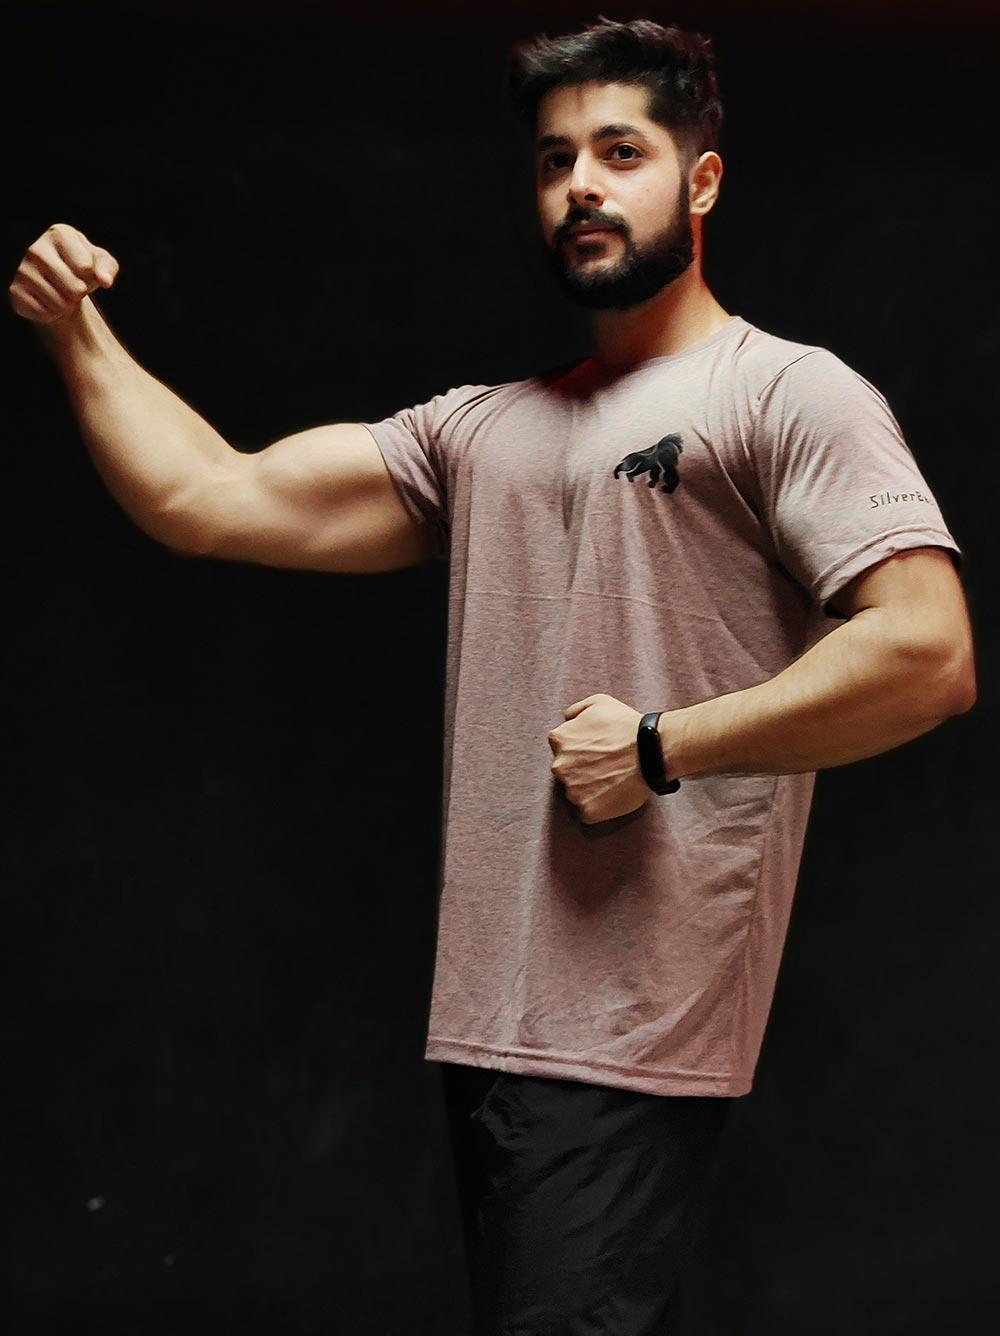 Carrot Half Sleeve T-shirt 2